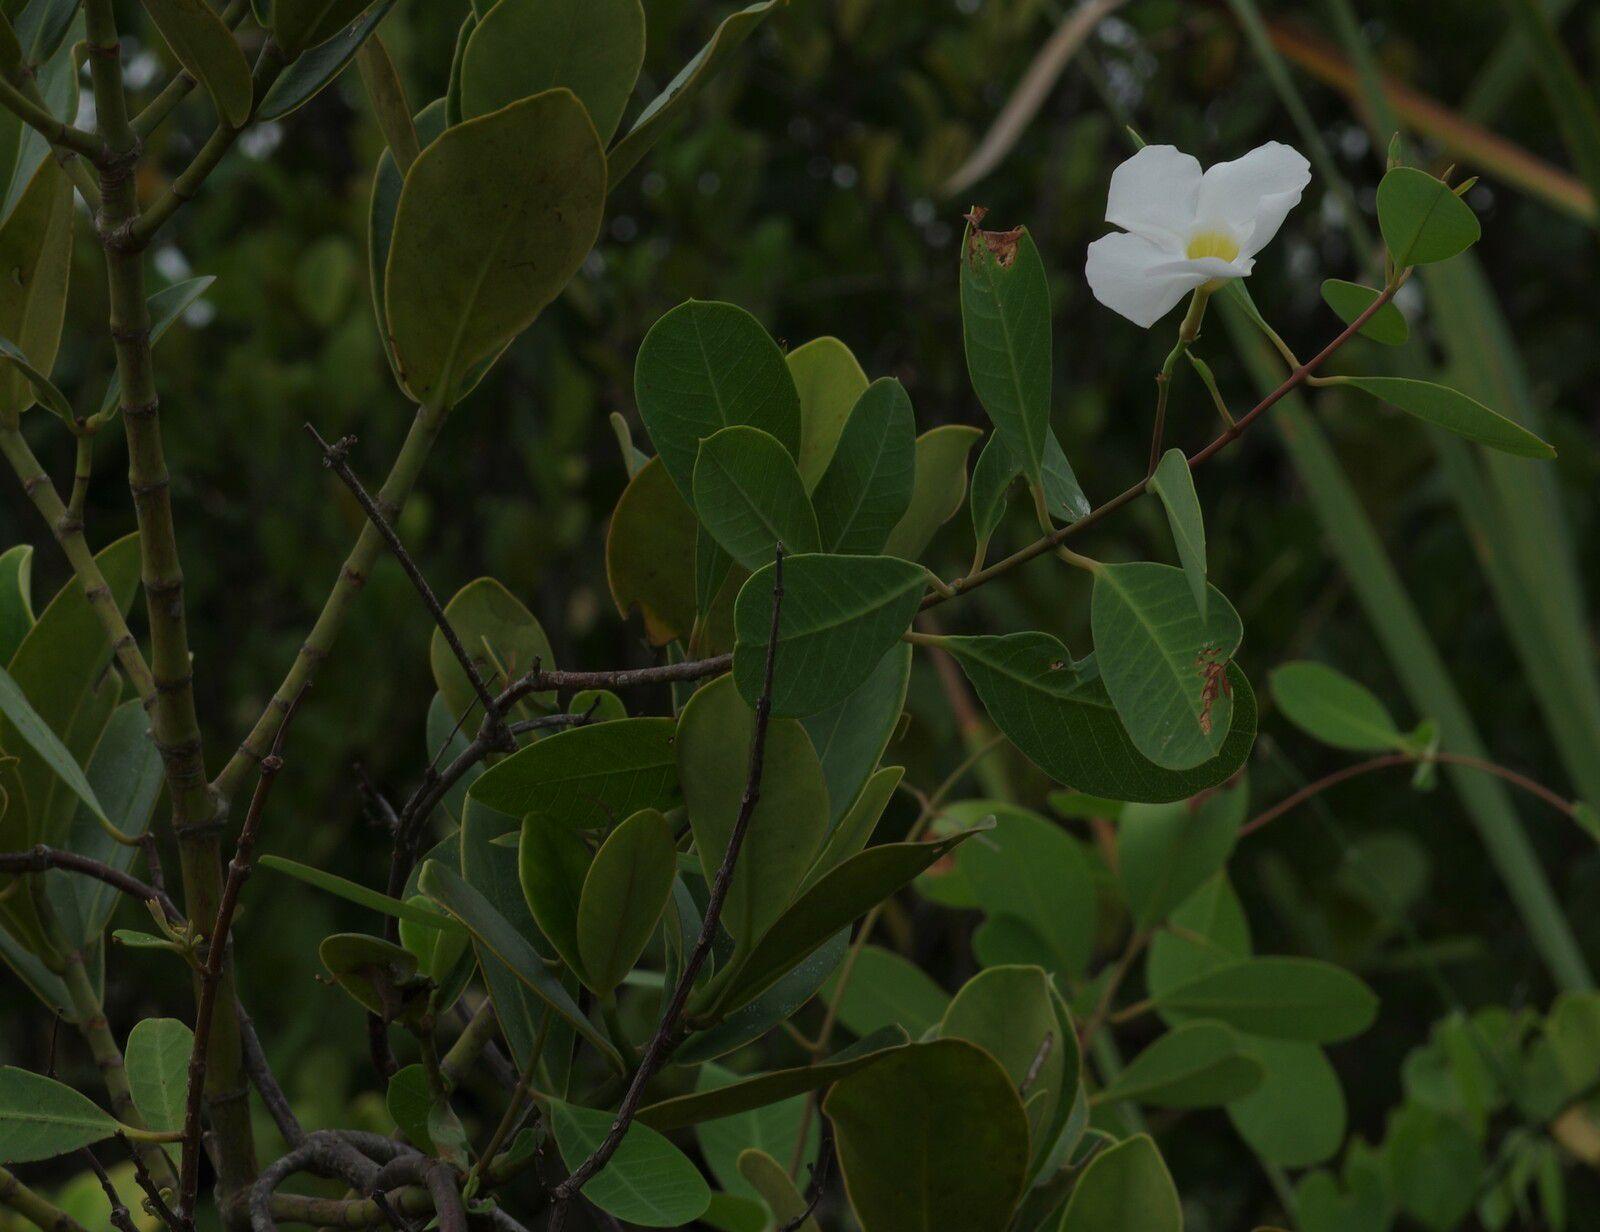 Rhabdadenia biflora